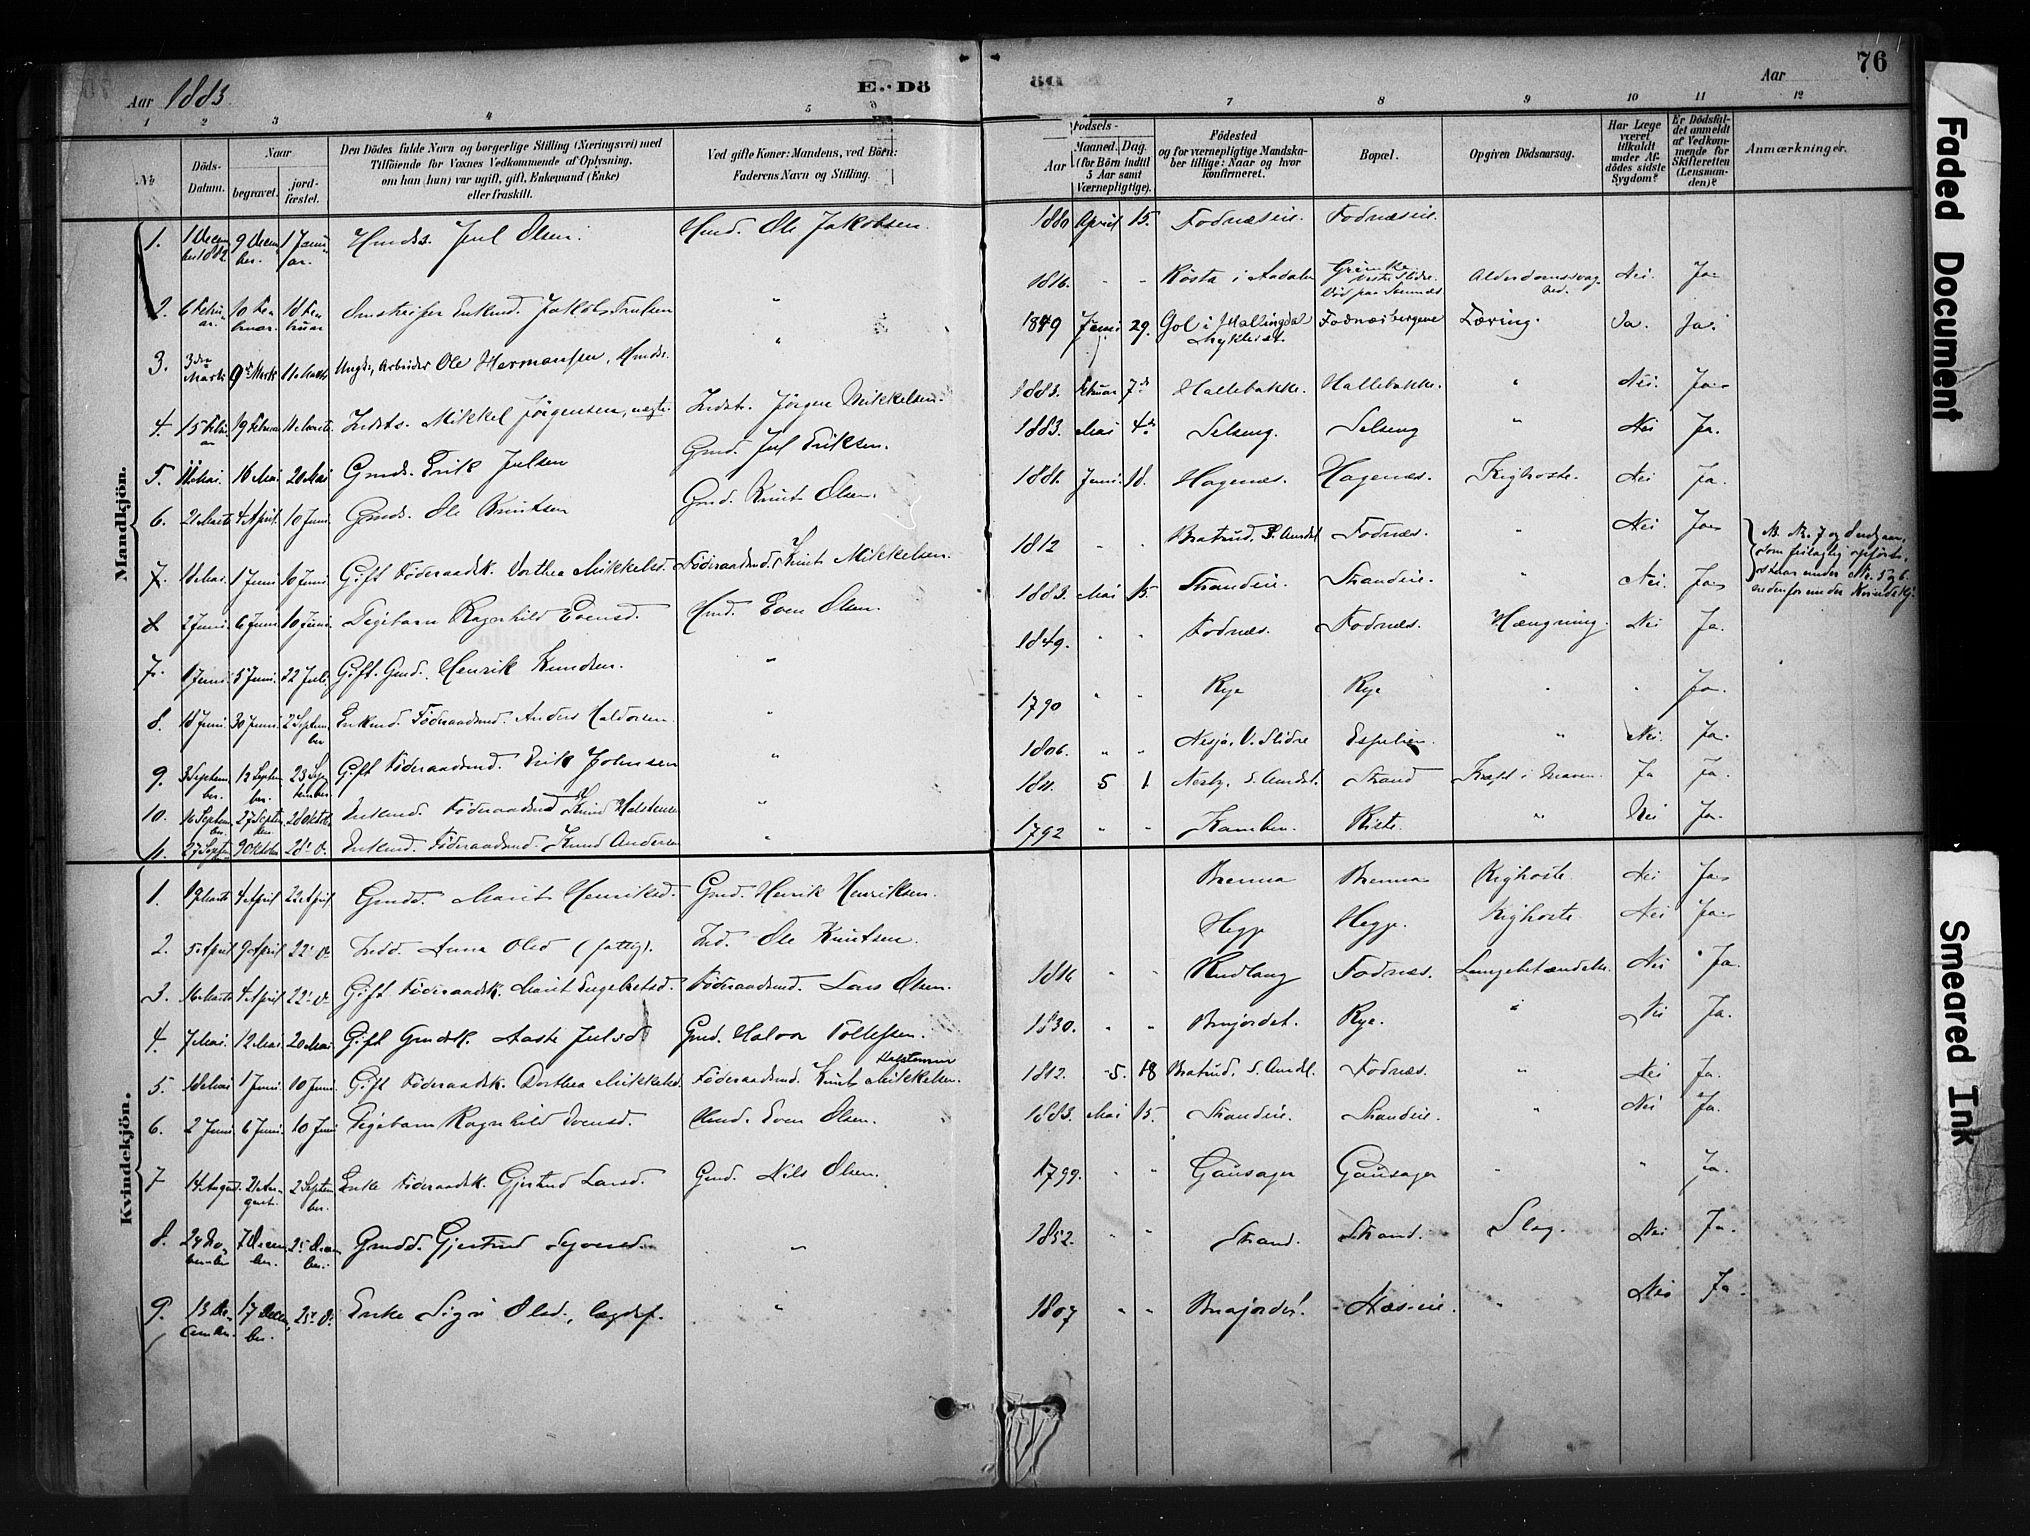 SAH, Nord-Aurdal prestekontor, Ministerialbok nr. 10, 1883-1896, s. 76